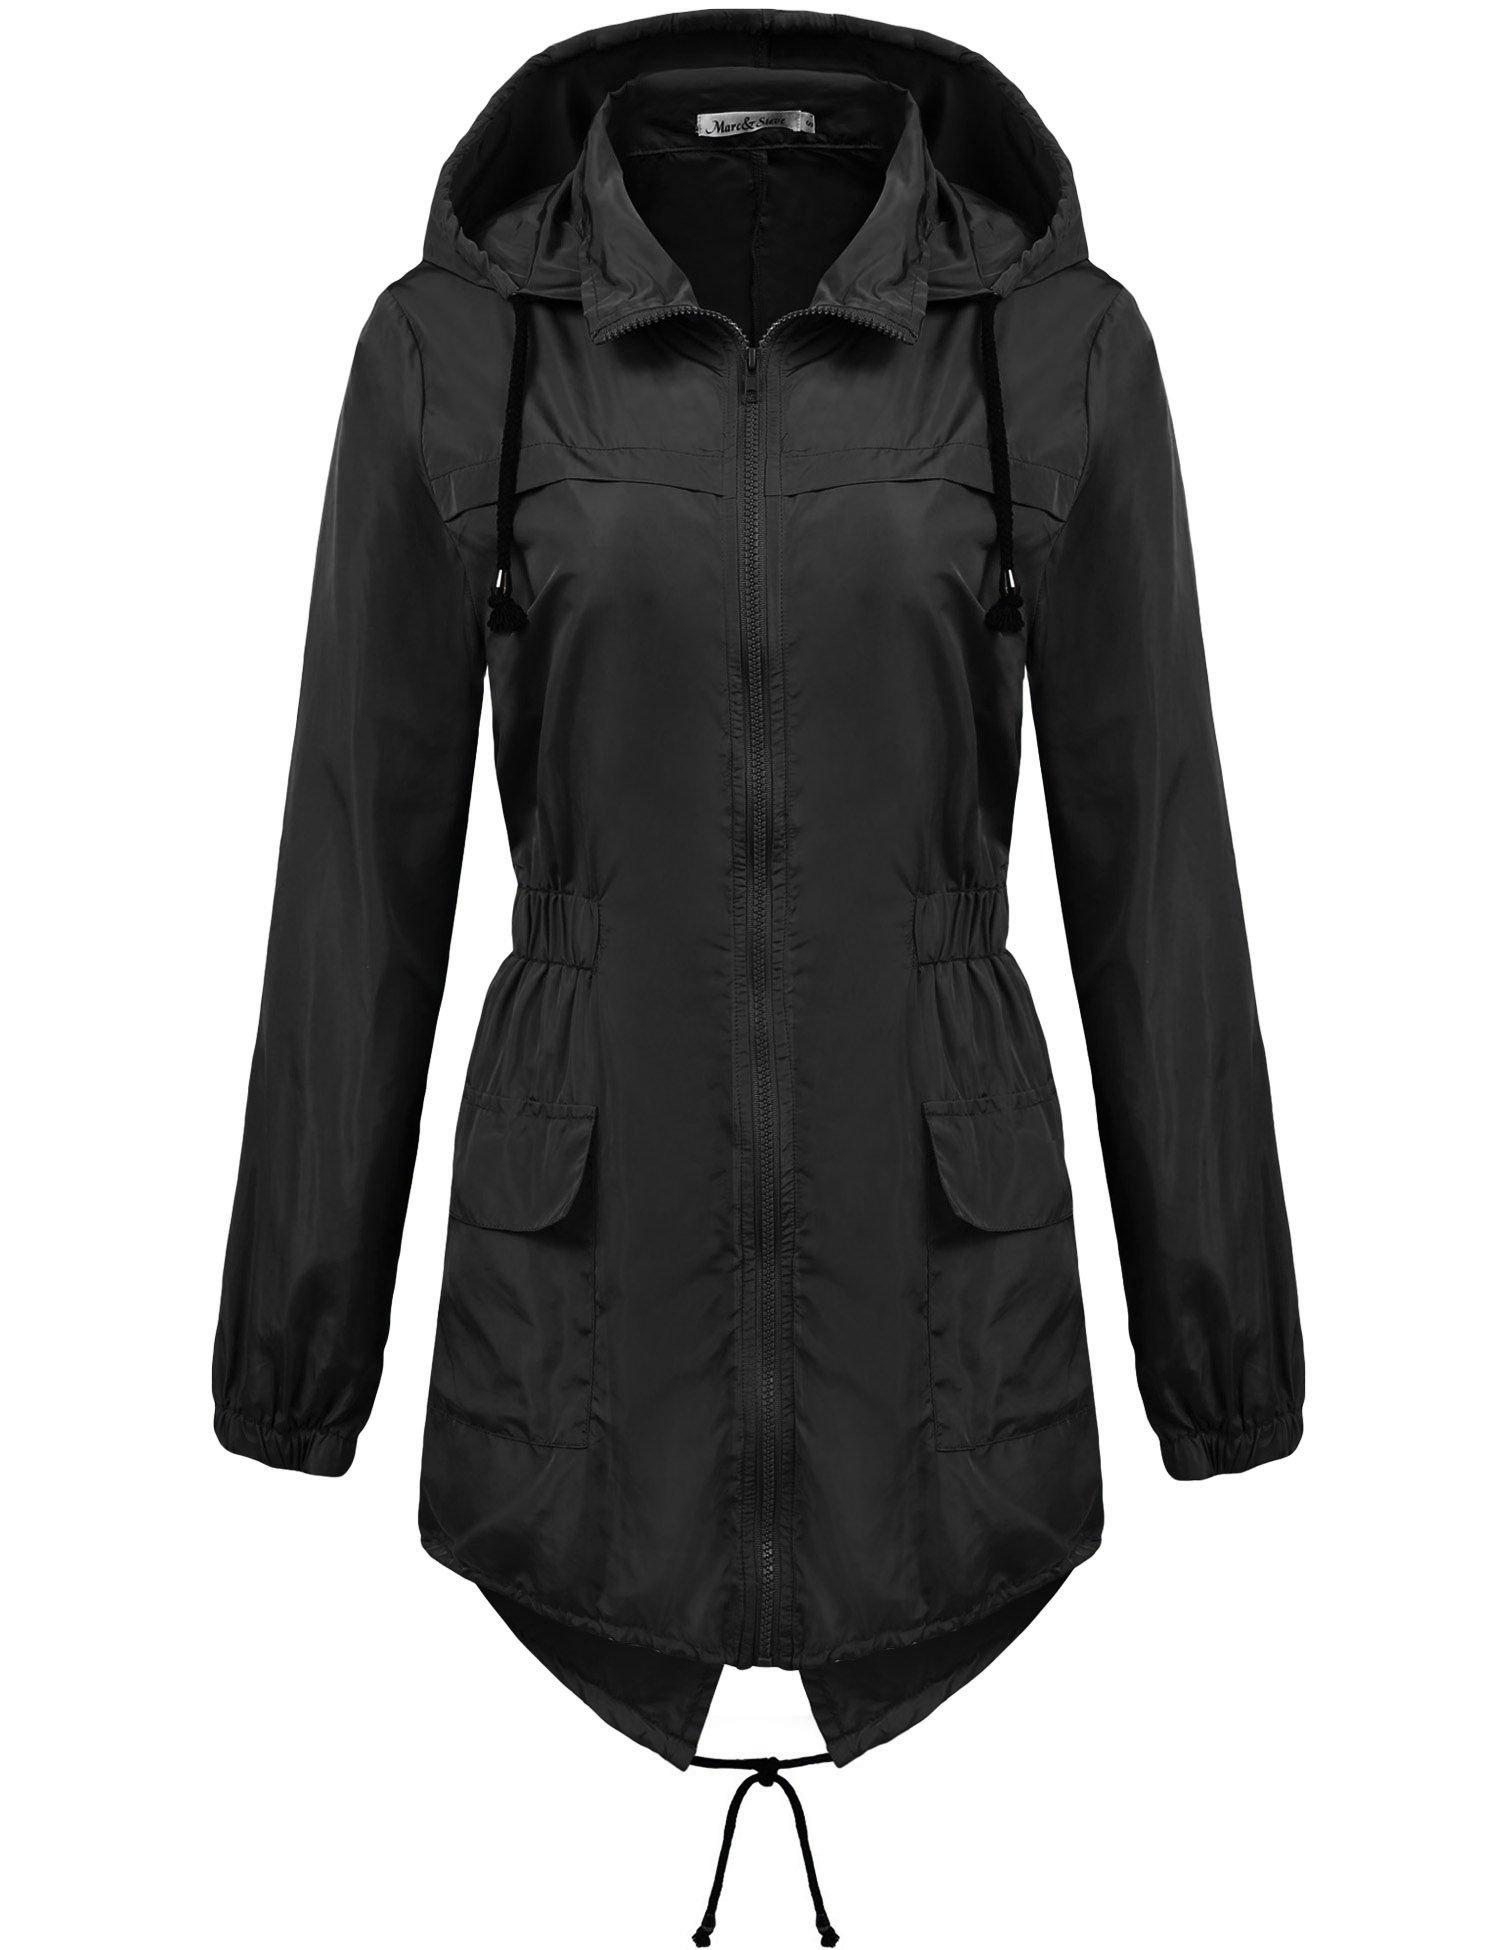 Macr&Steve Womens Lightweight Hooded Waterproof Active Outdoor Rain Jacket,Black,X-Large